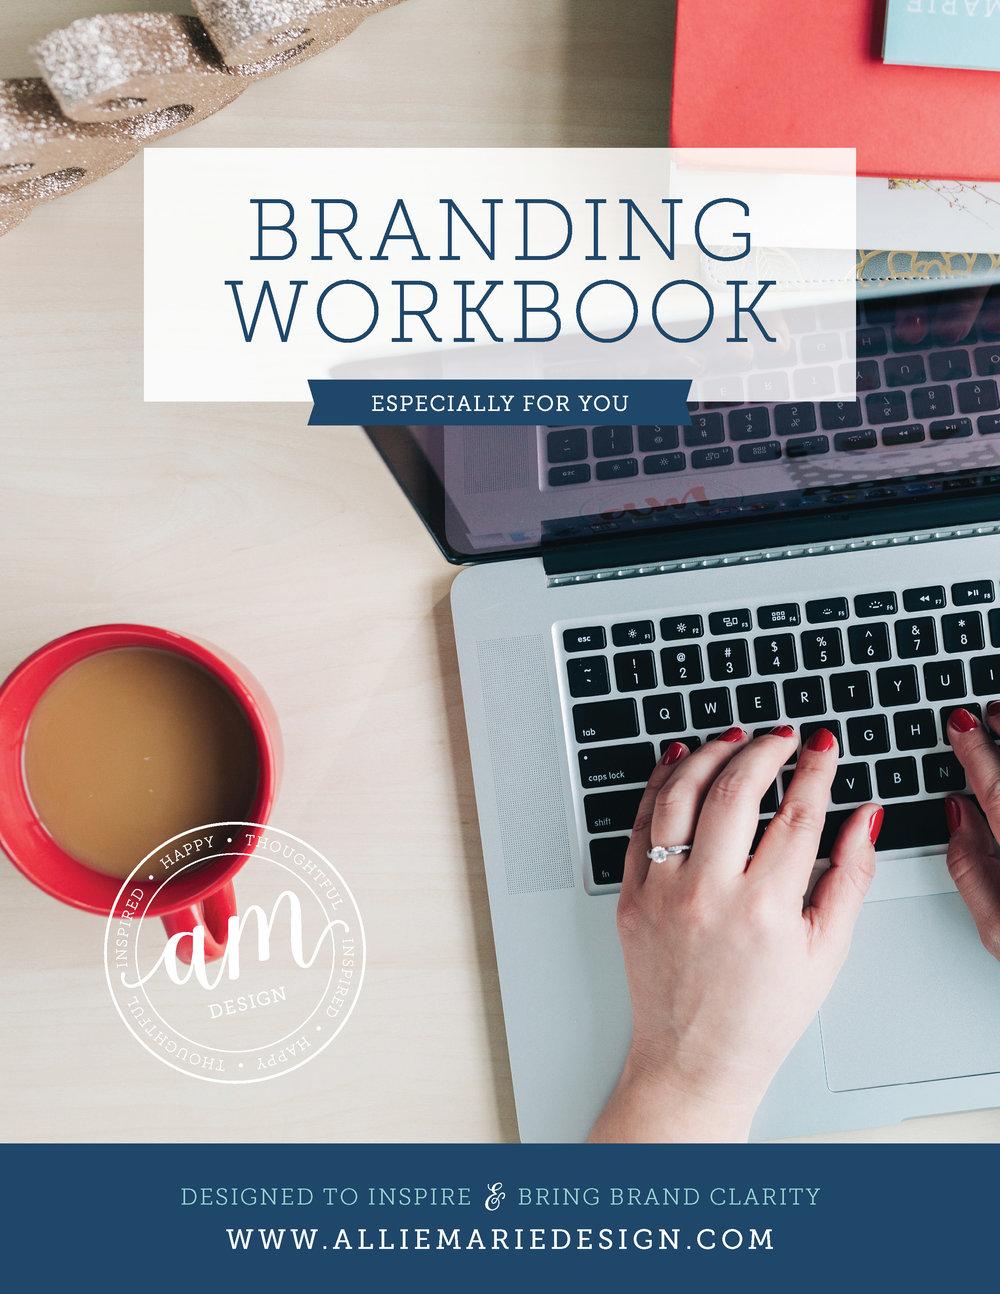 AllieMarie Design Branding Workbook Freebie